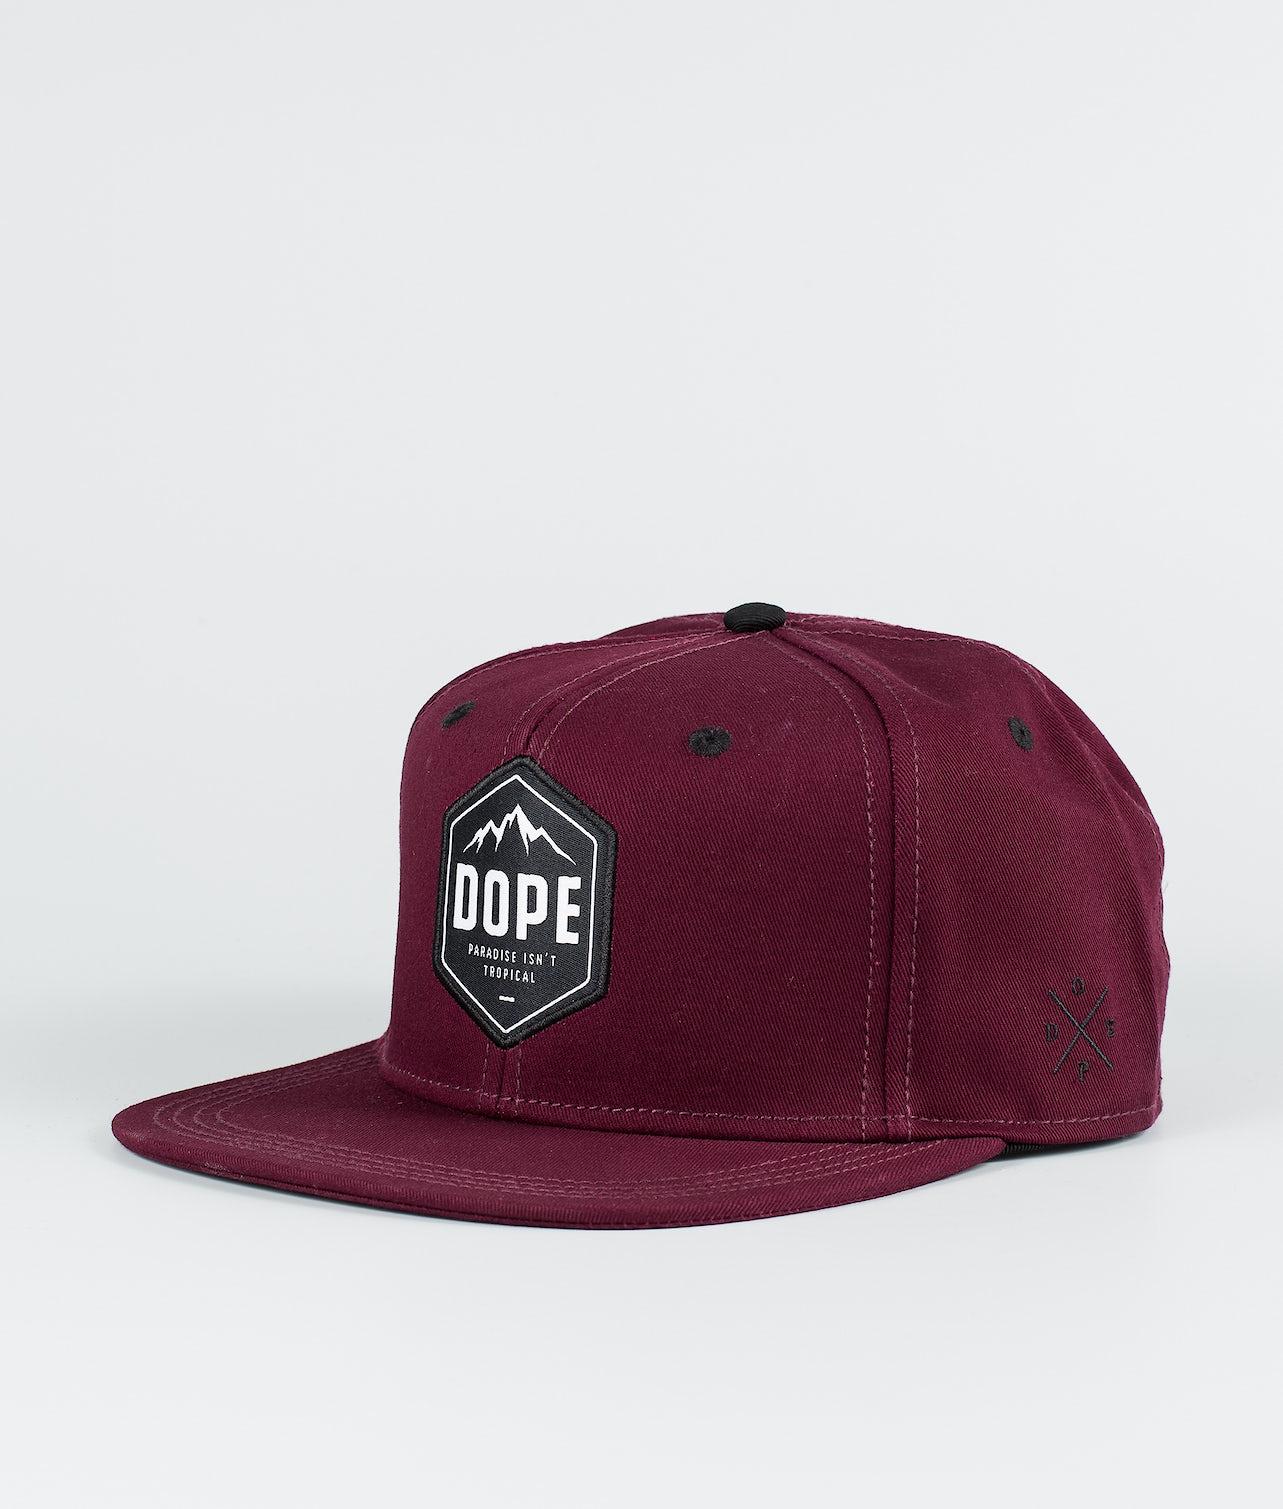 Dope Paradise Caps Burgundy